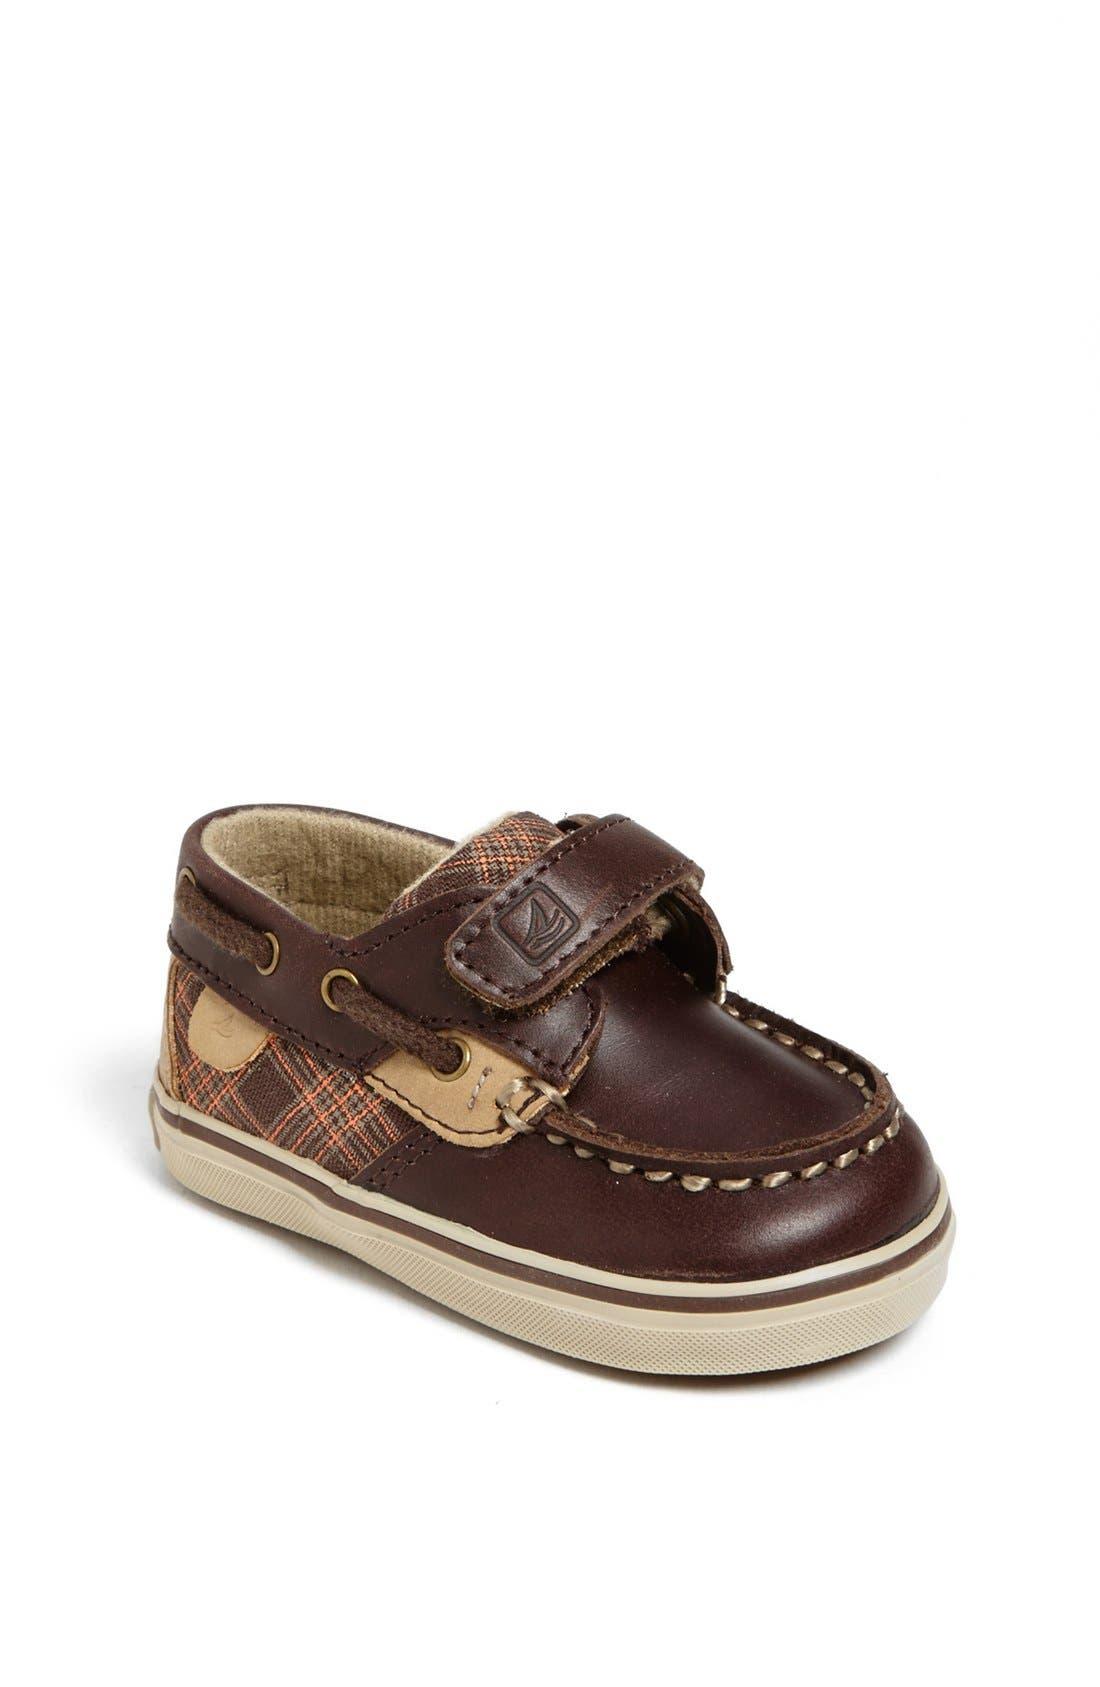 Alternate Image 1 Selected - Sperry Kids 'Bluefish' Crib Shoe (Baby)